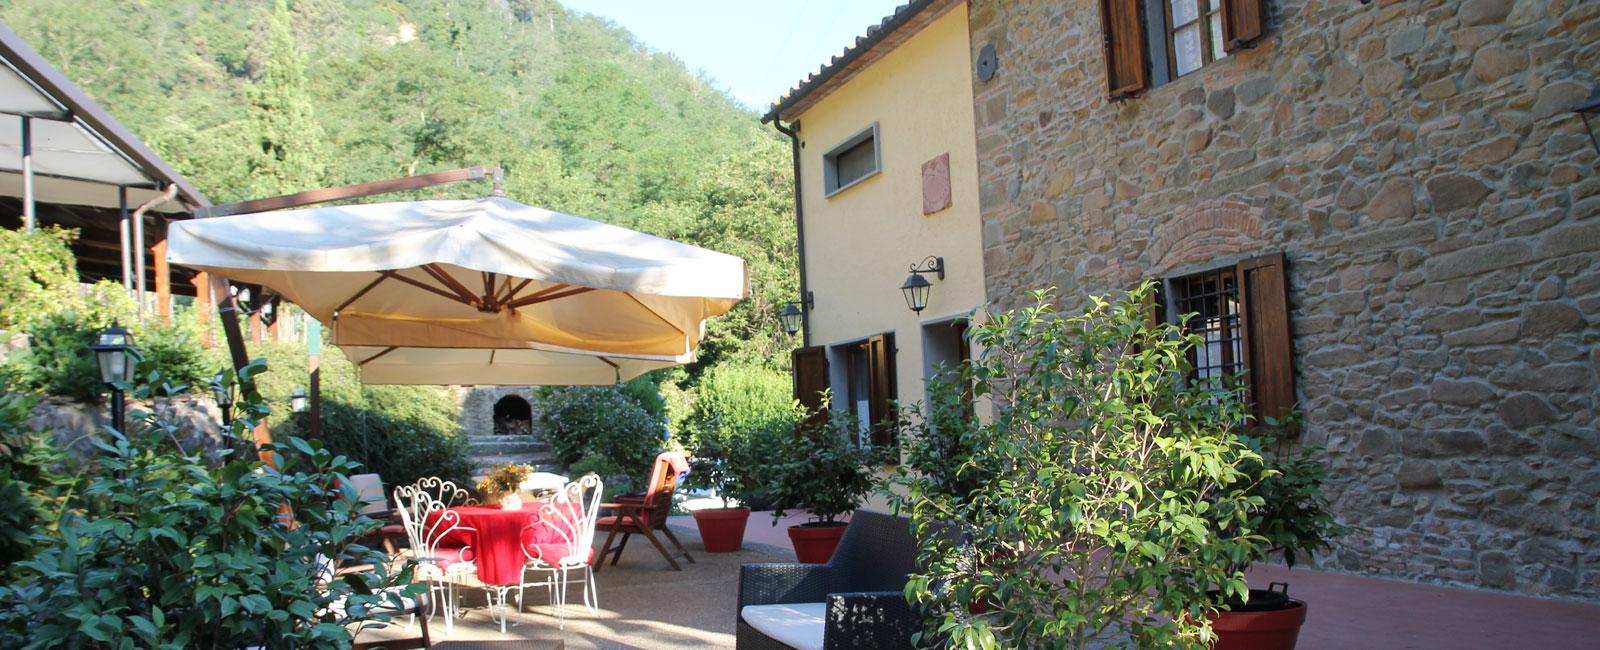 Agriturismo Gli Arancini - Pistoia Toscana